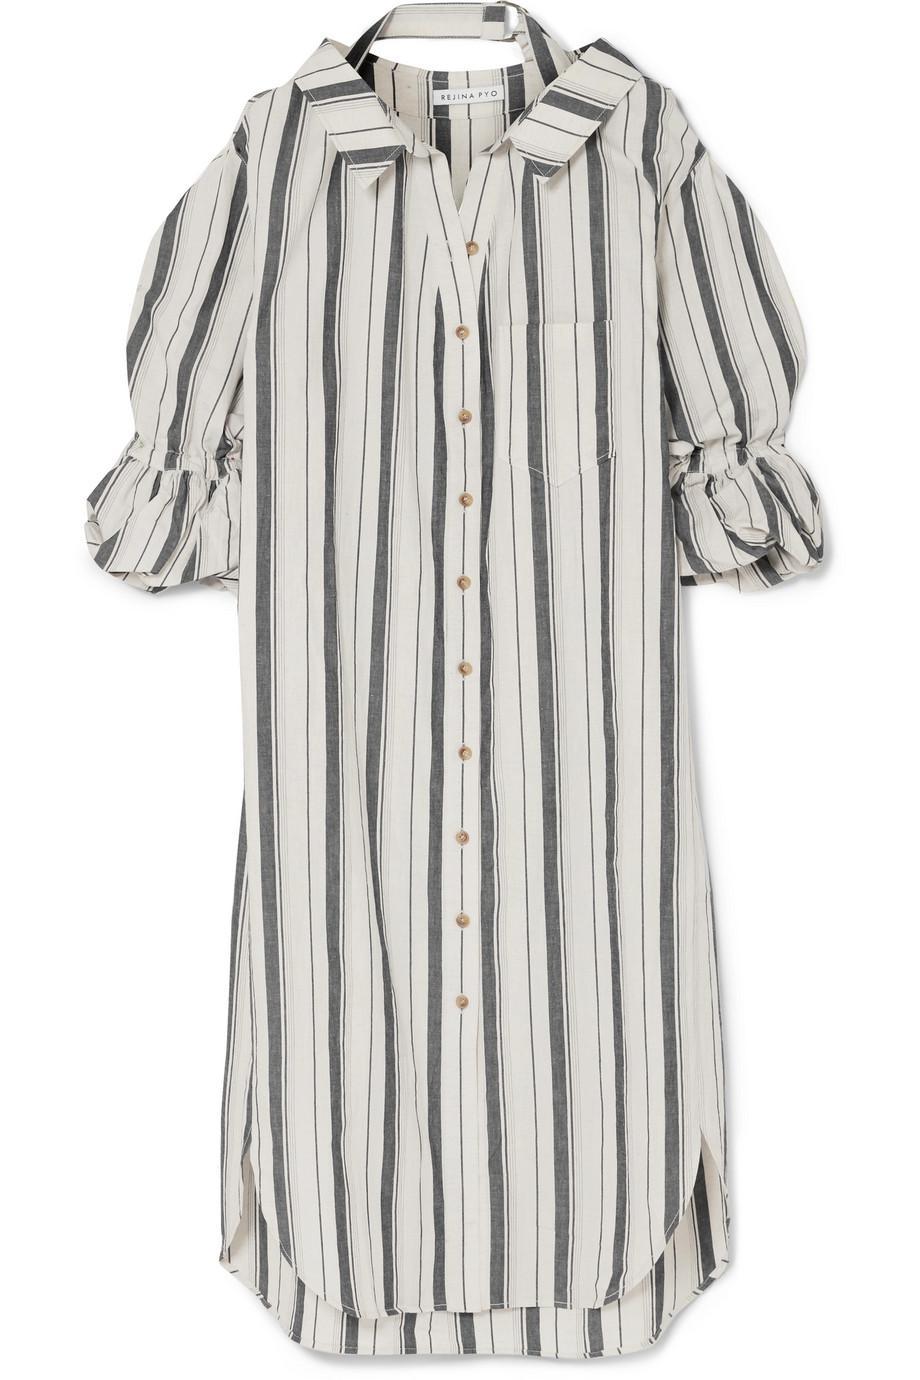 Outlet Excellent Amber Striped Cotton And Linen-blend Shirt Dress - Blue Rejina Pyo Super T5cUfvWn